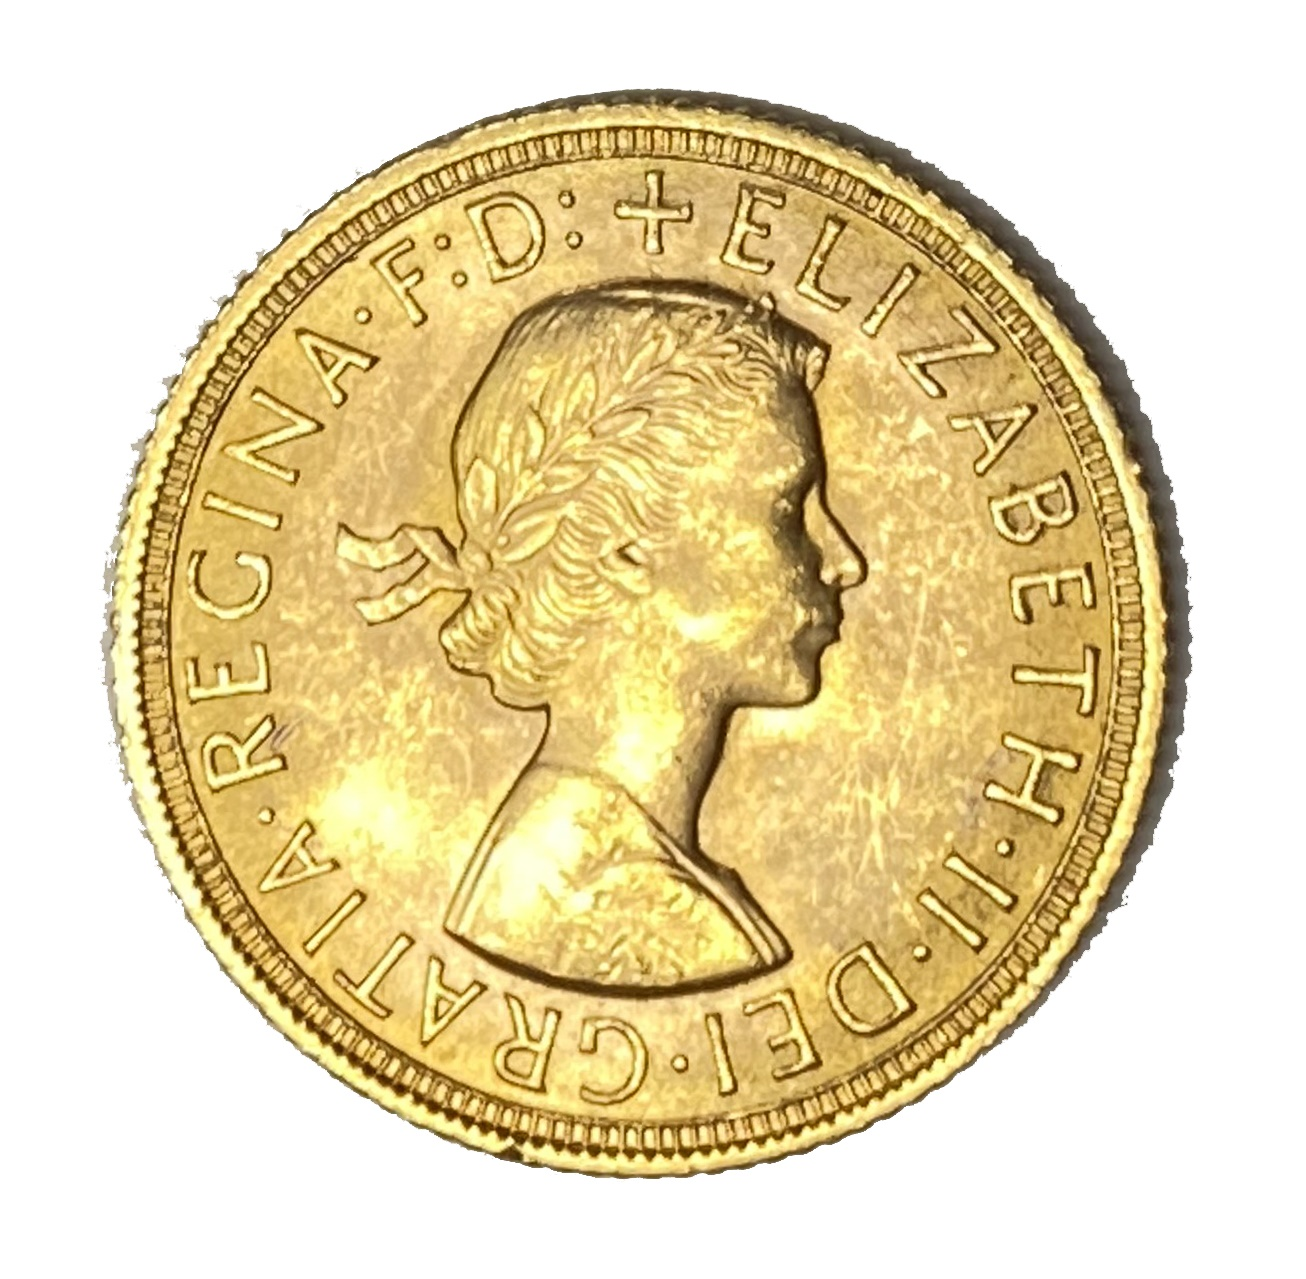 Elizabeth II gold Sovereign coin, 1958